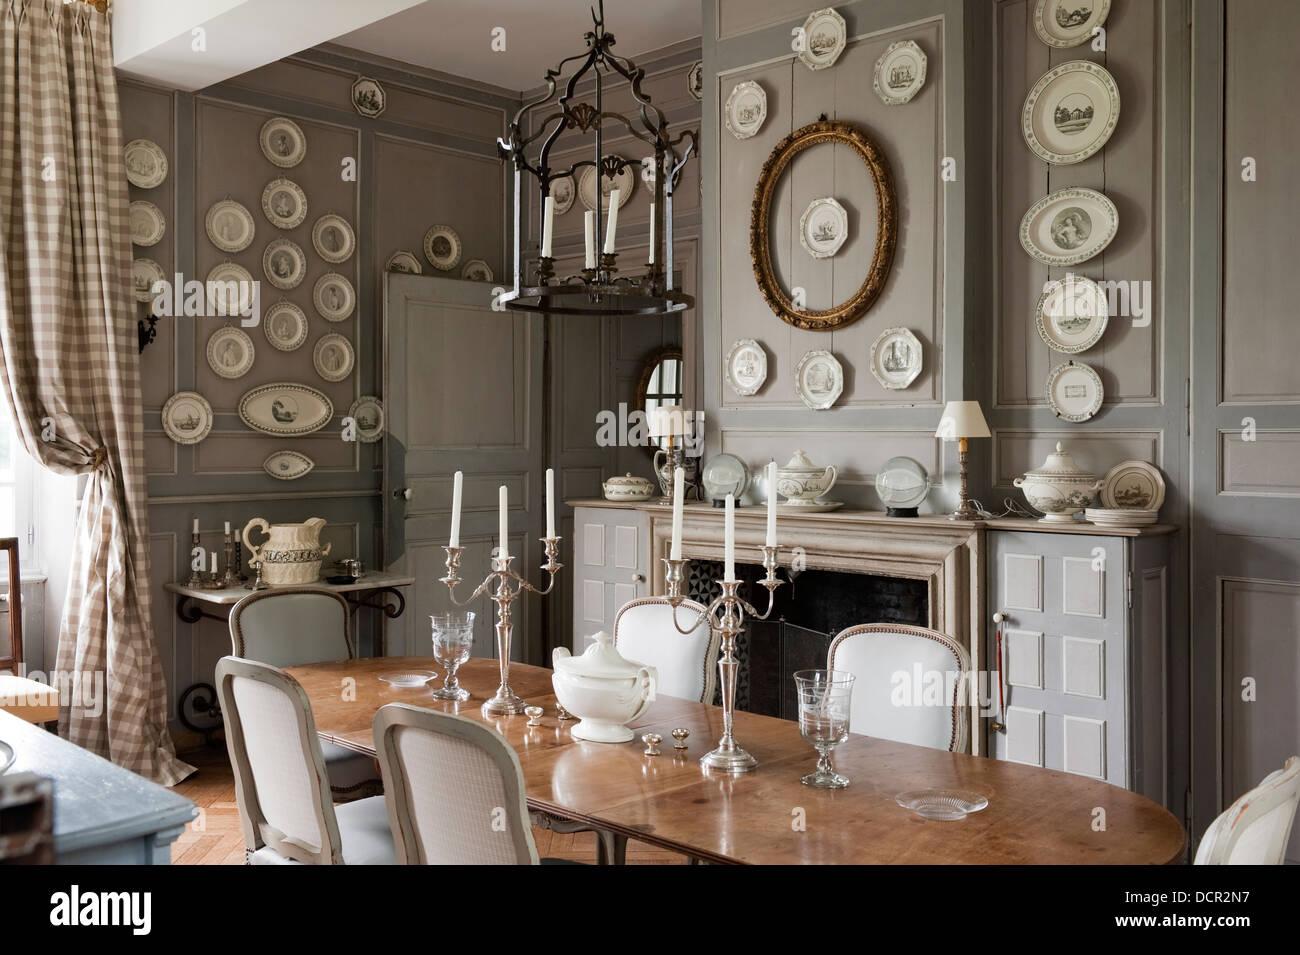 Elegant Dining Room Stock Photos & Elegant Dining Room Stock Images ...